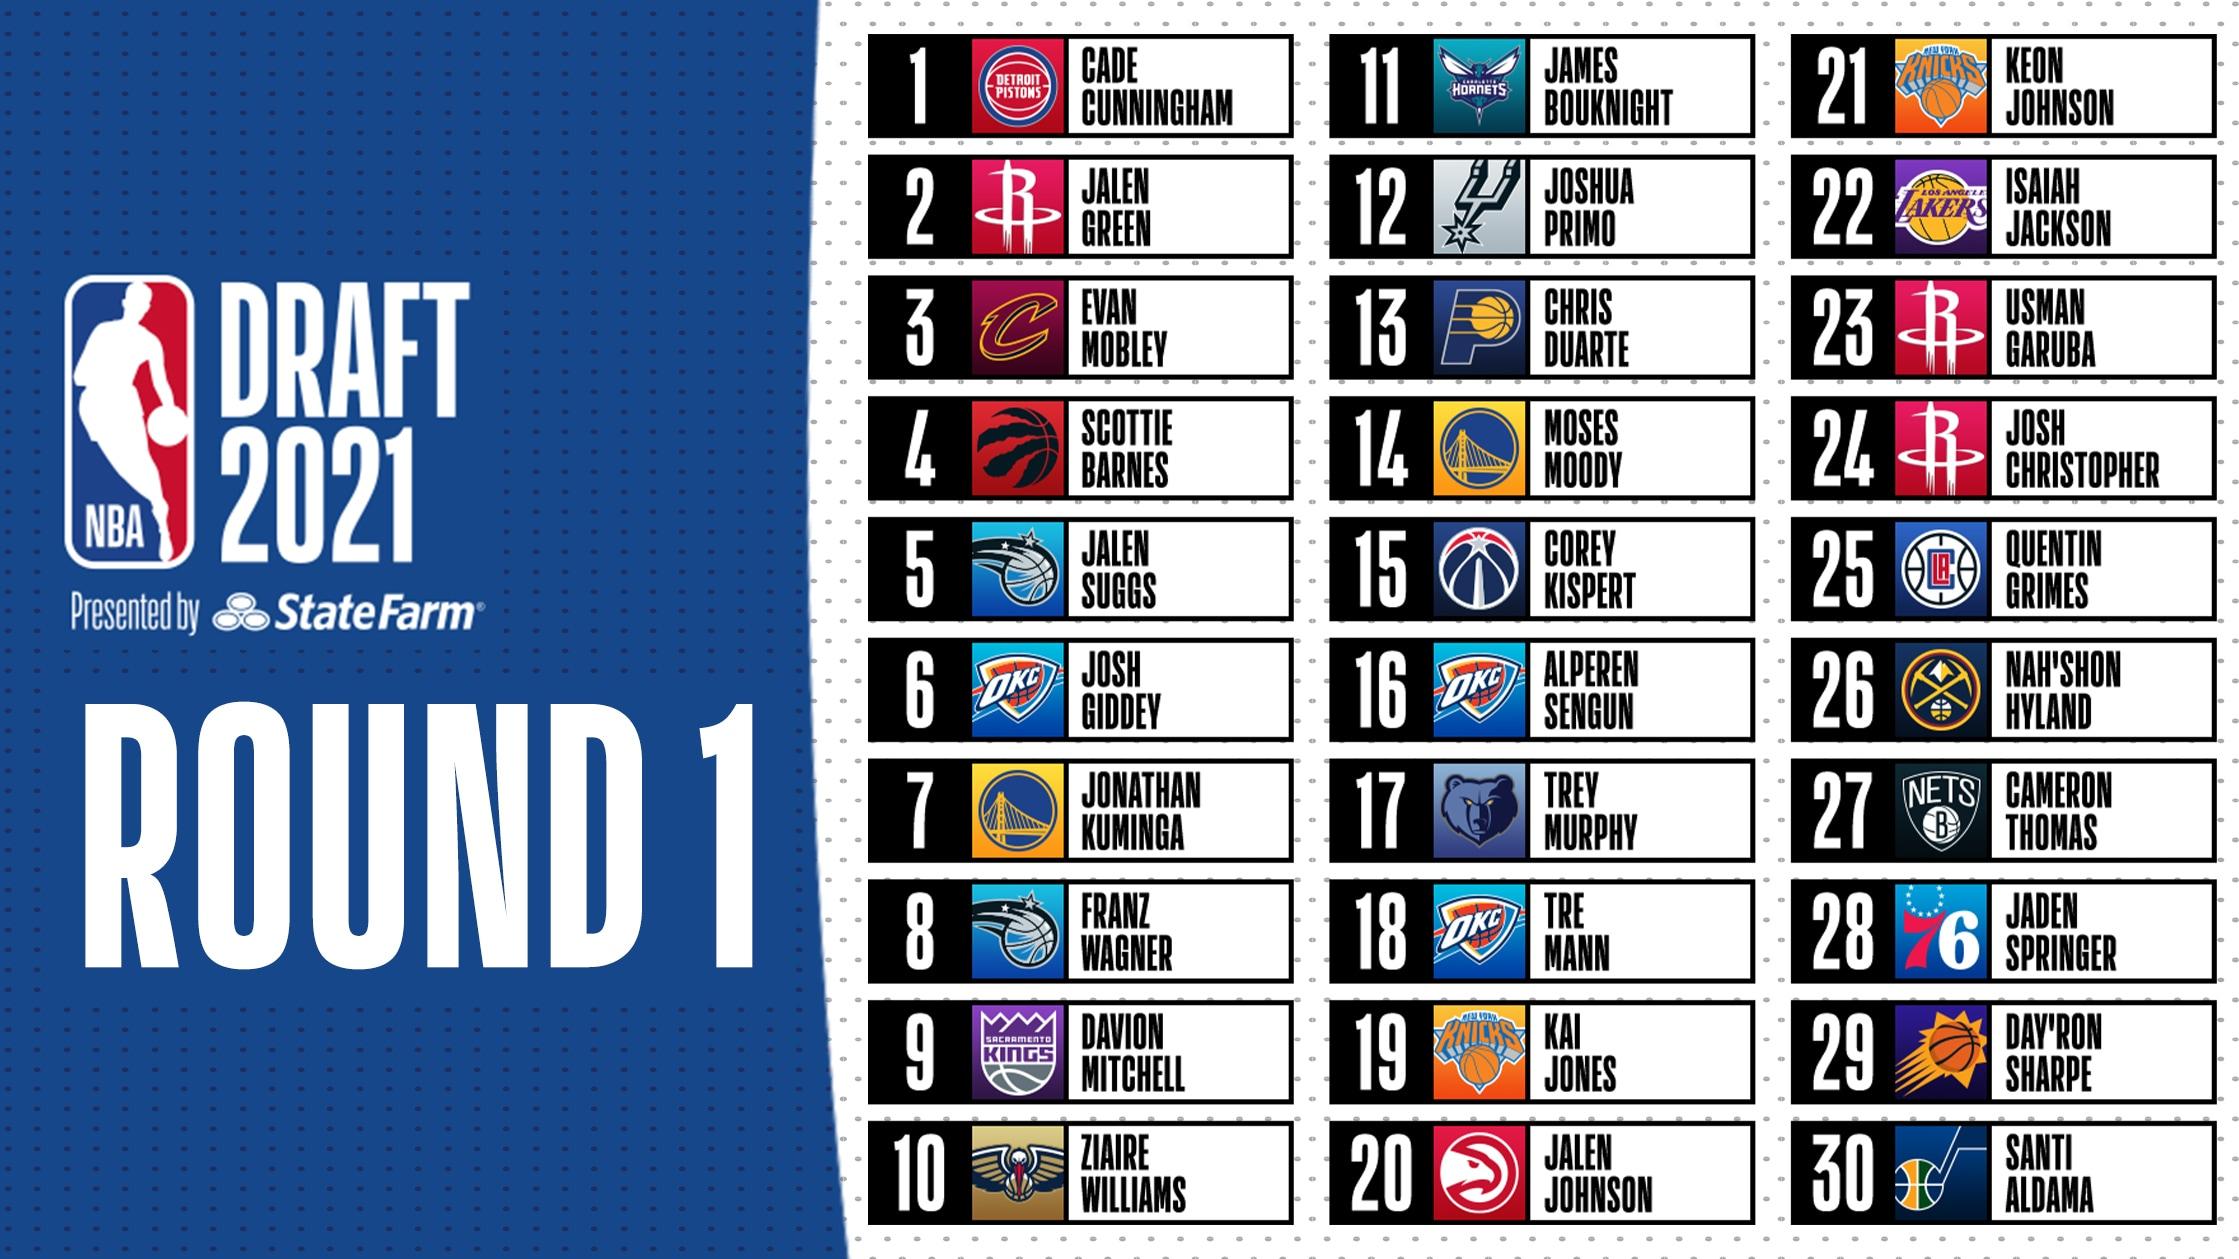 2021 NBA Draft results: Picks 1-60